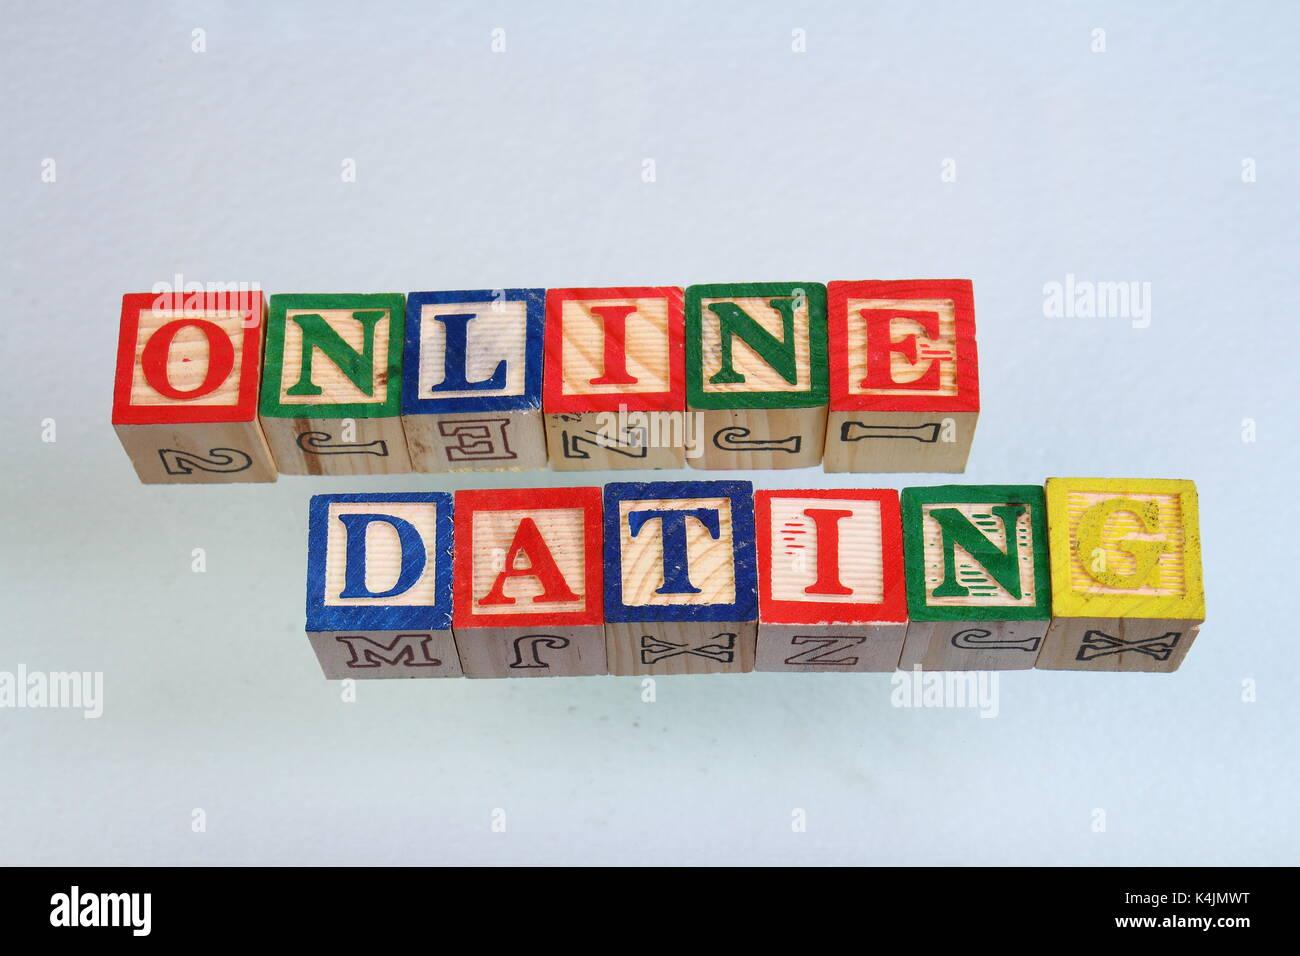 Gauteng rencontres en ligne